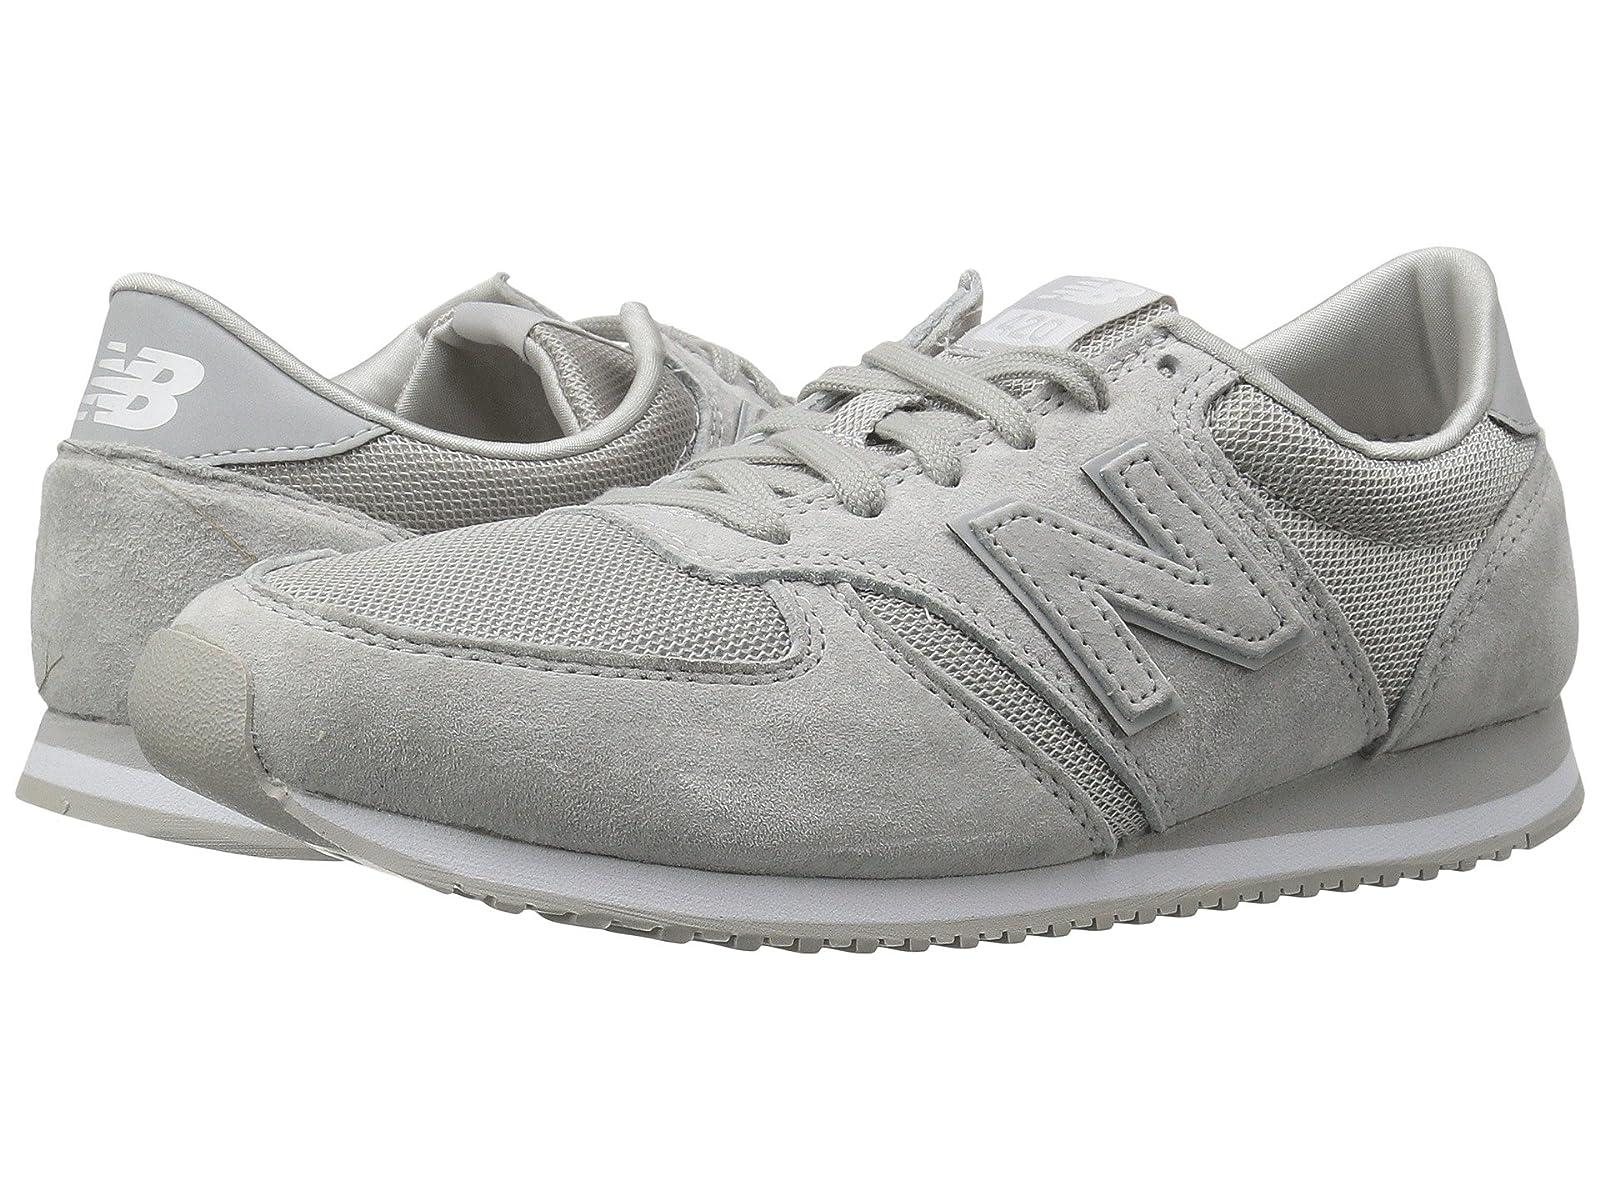 New Balance Classics WL420v1Cheap and distinctive eye-catching shoes